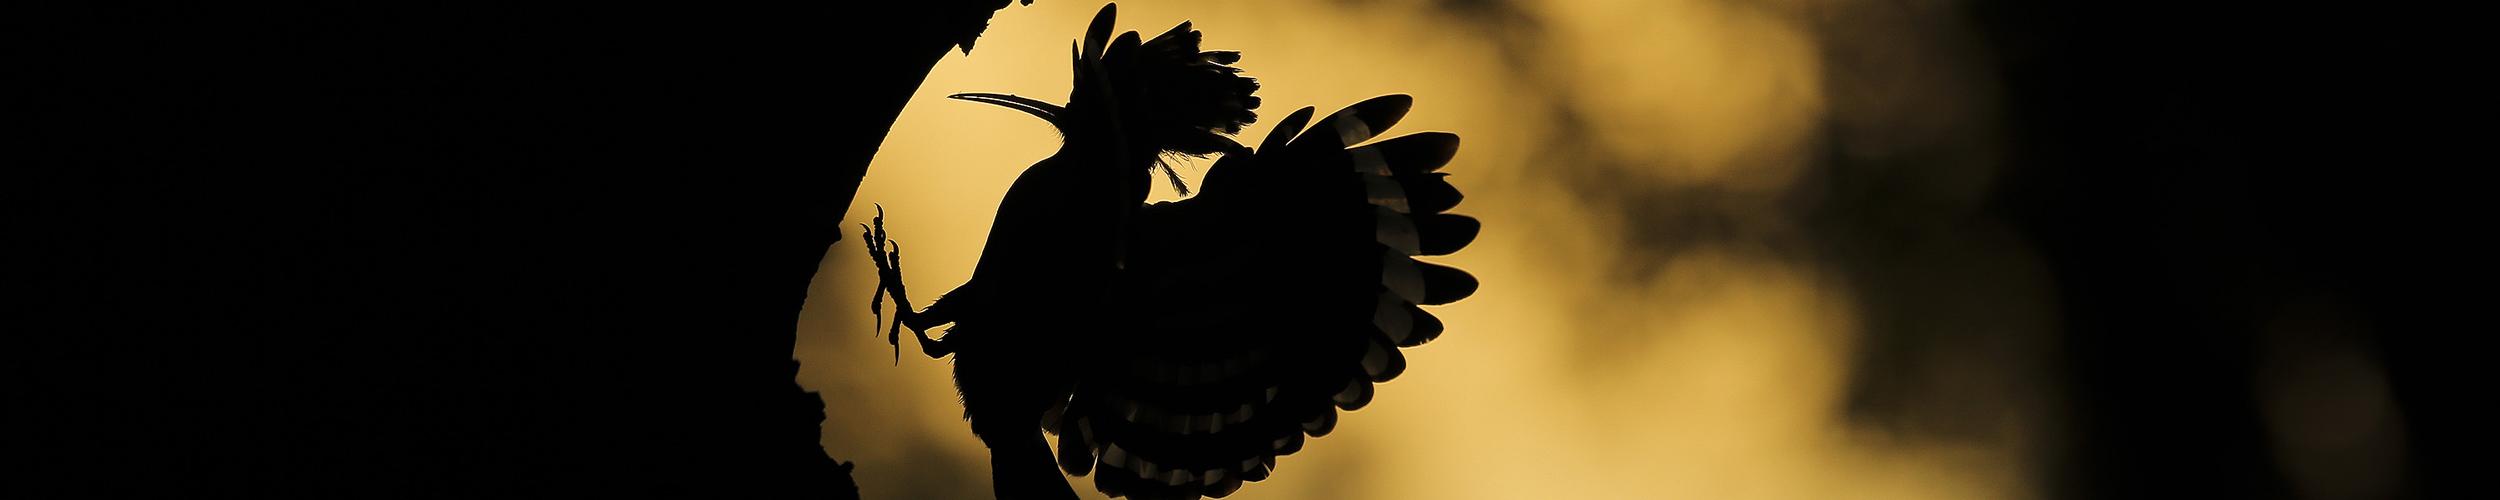 Teddy Bracard - Oiseaux sauvages de pleine nature